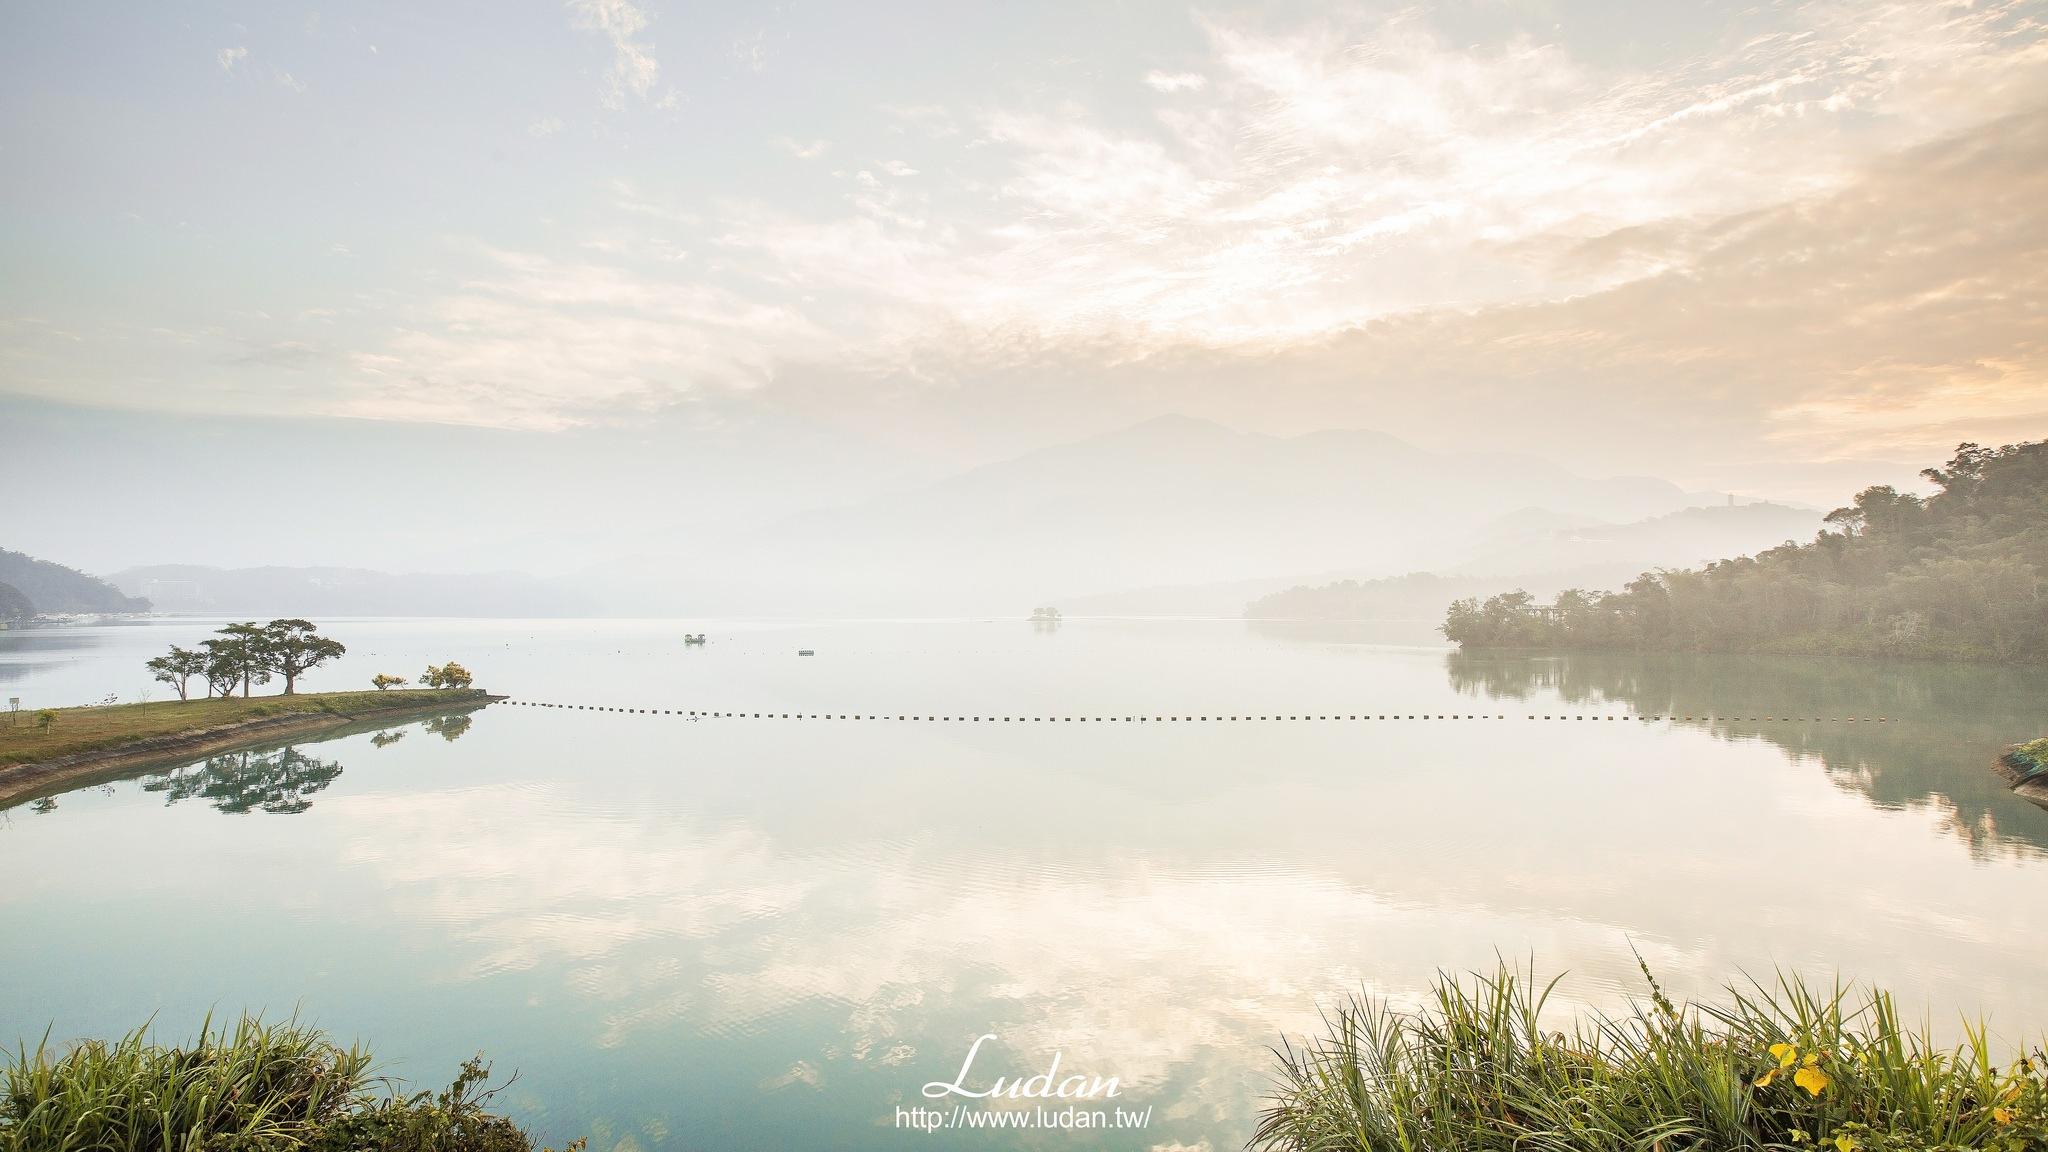 Morning by Chao-chin Yang